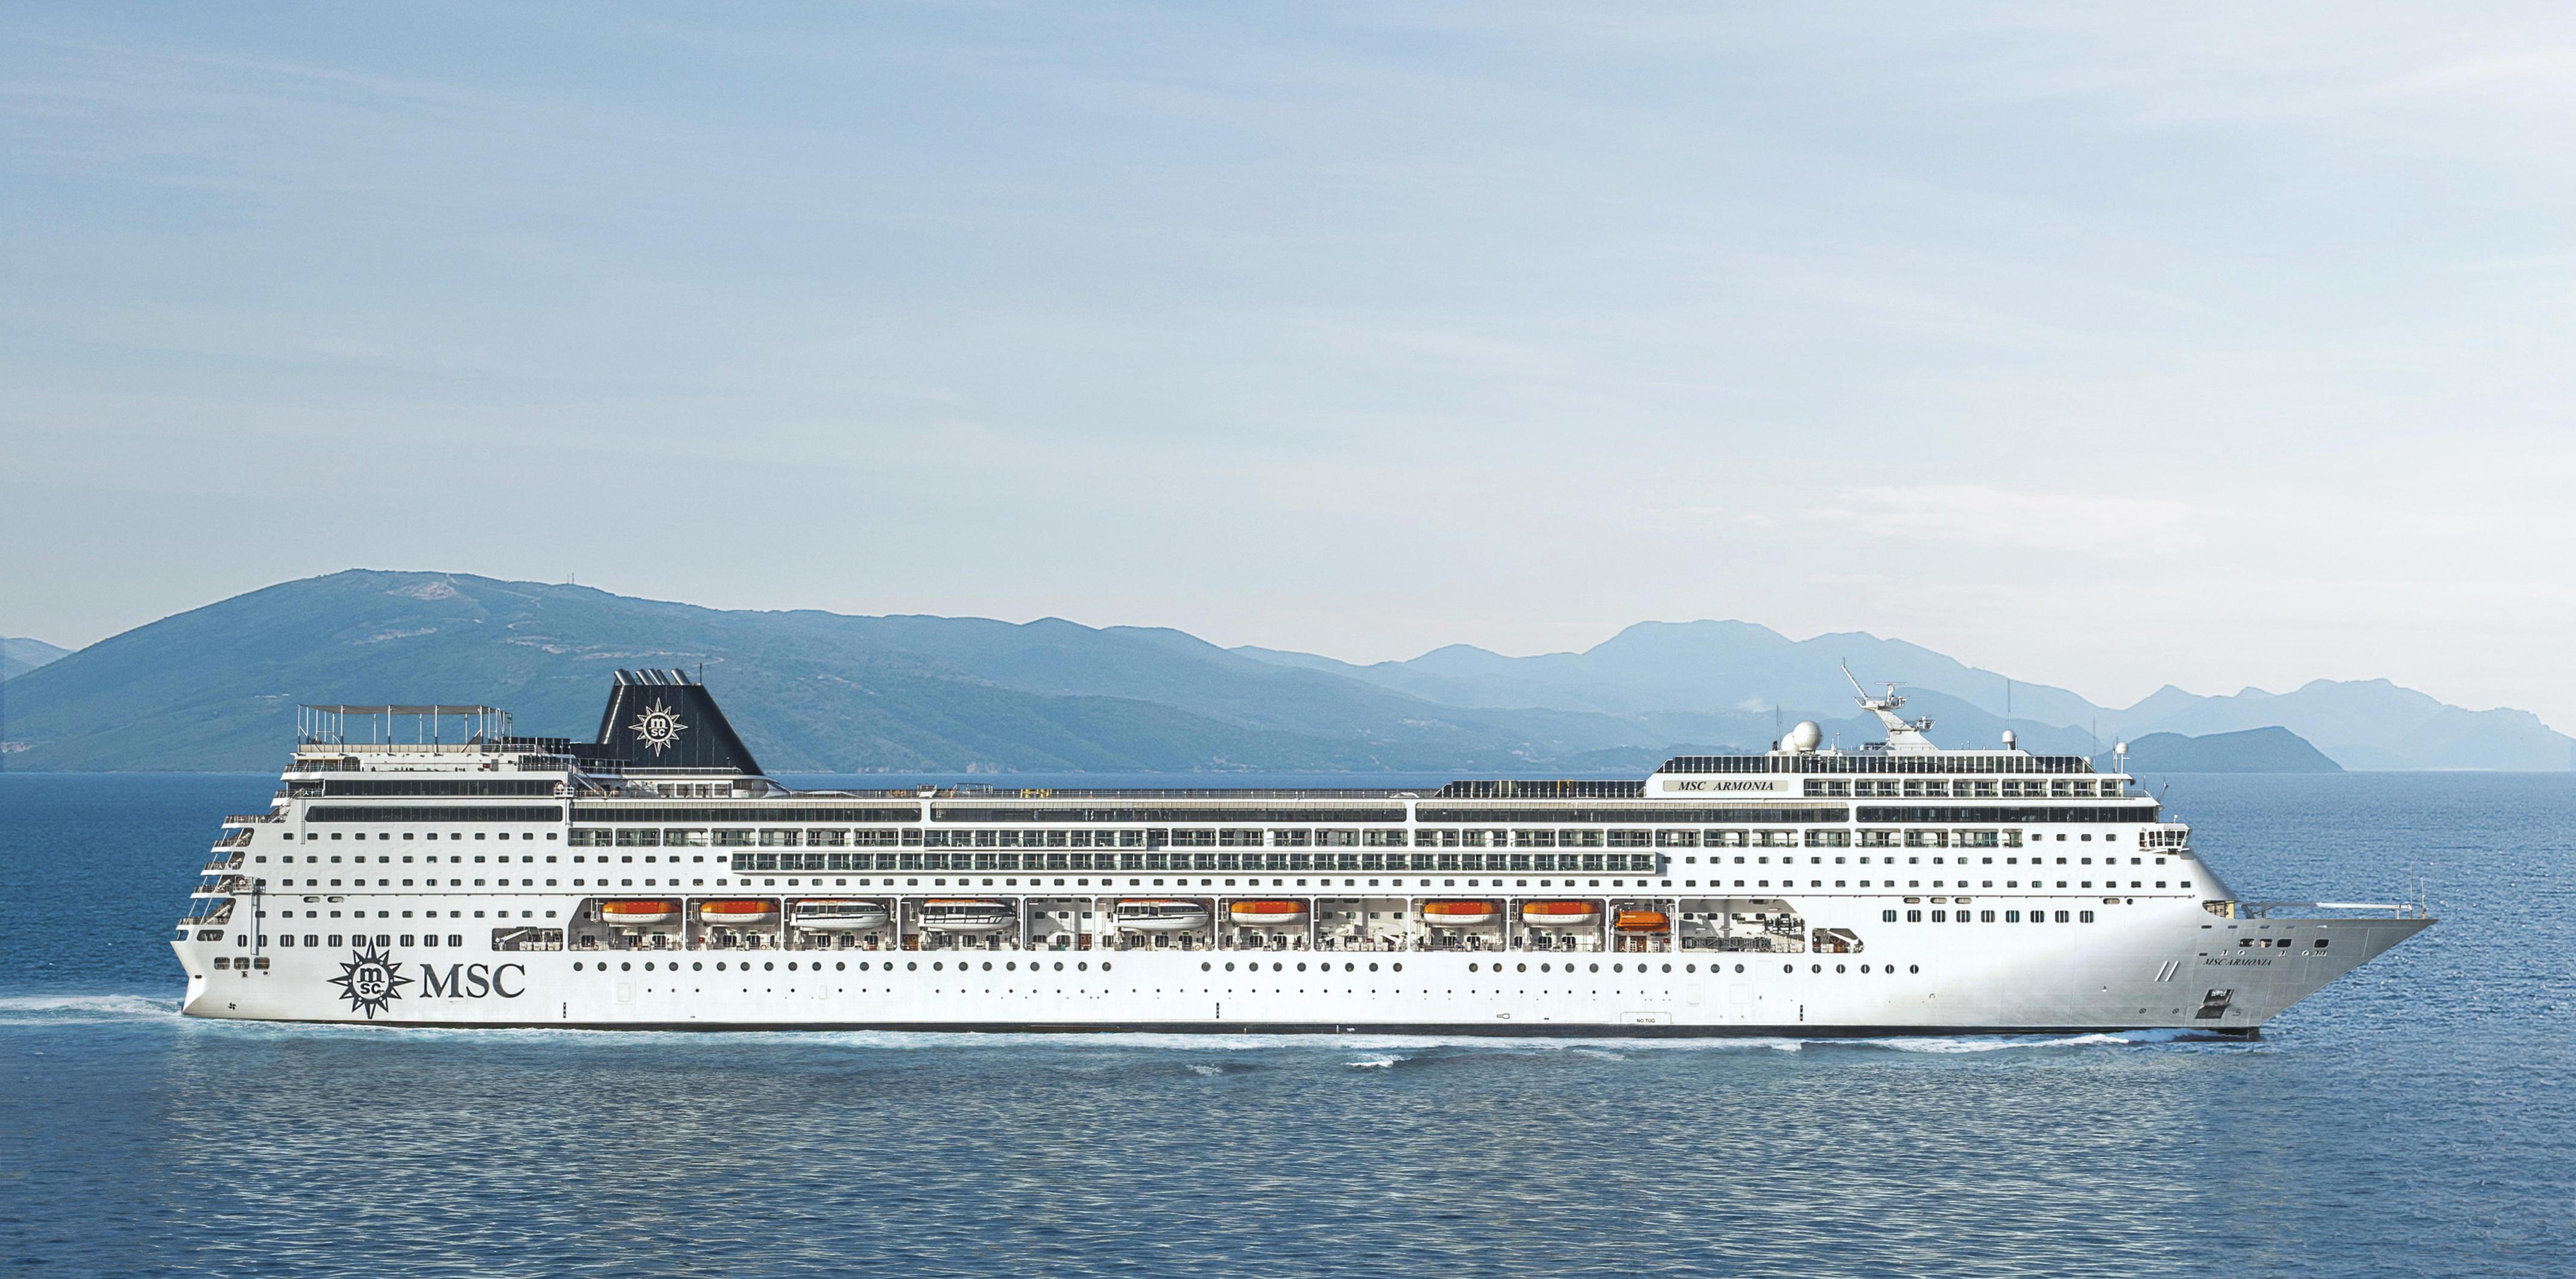 MSC Cruises MSC Armonia Cruise Ship Reviews UPDATED - Msc armonia